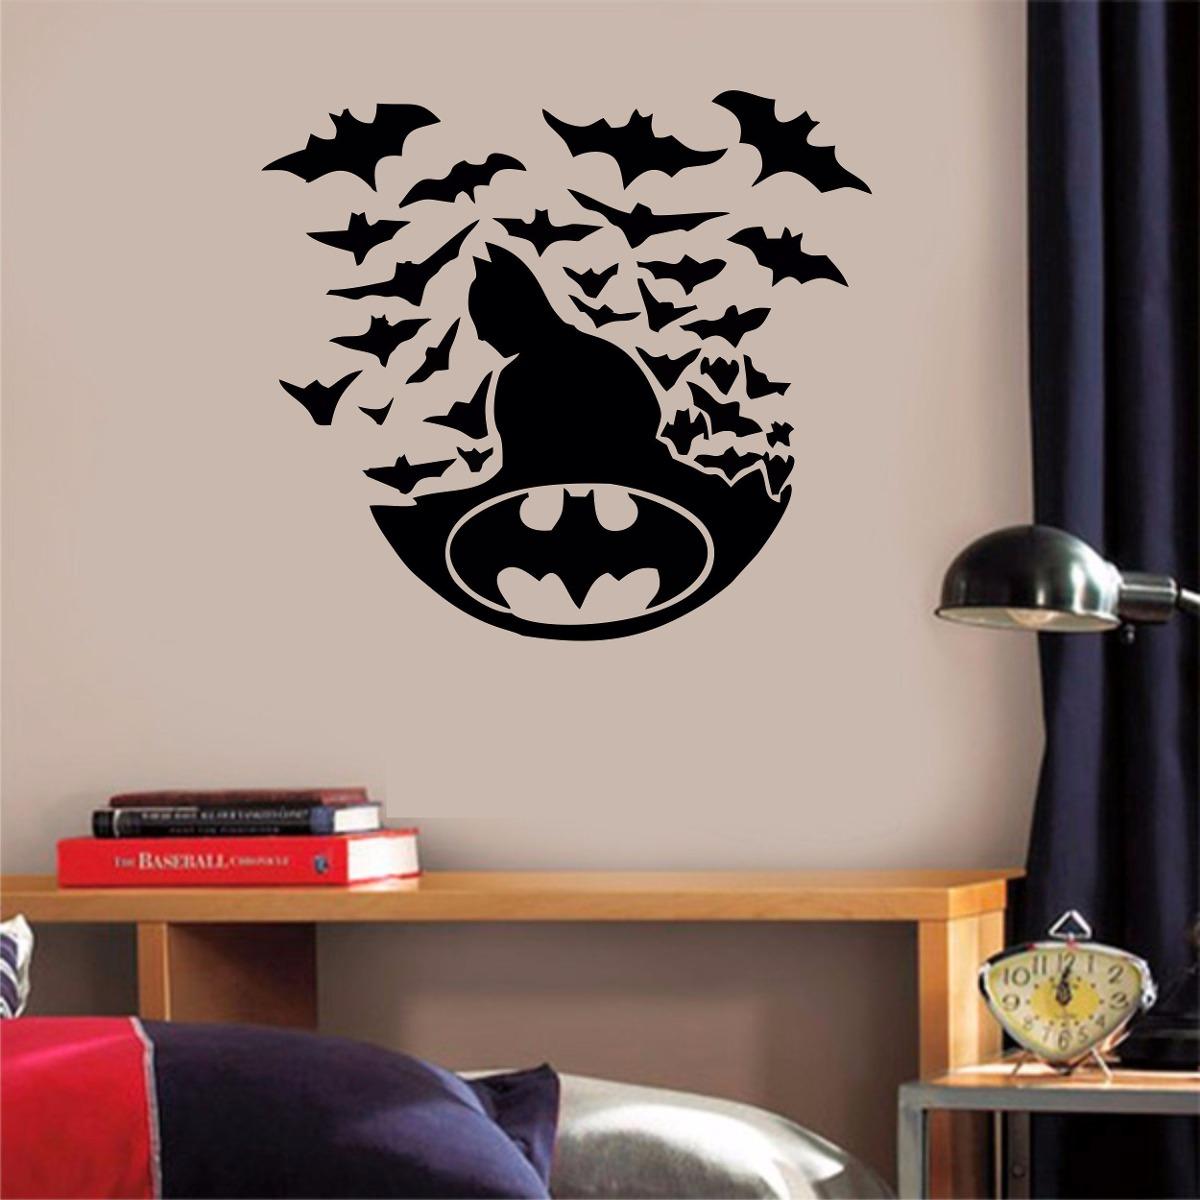 fb20eadbde9a51 Adesivo Parede Quarto Infantil Super Heroi Batman Coringa